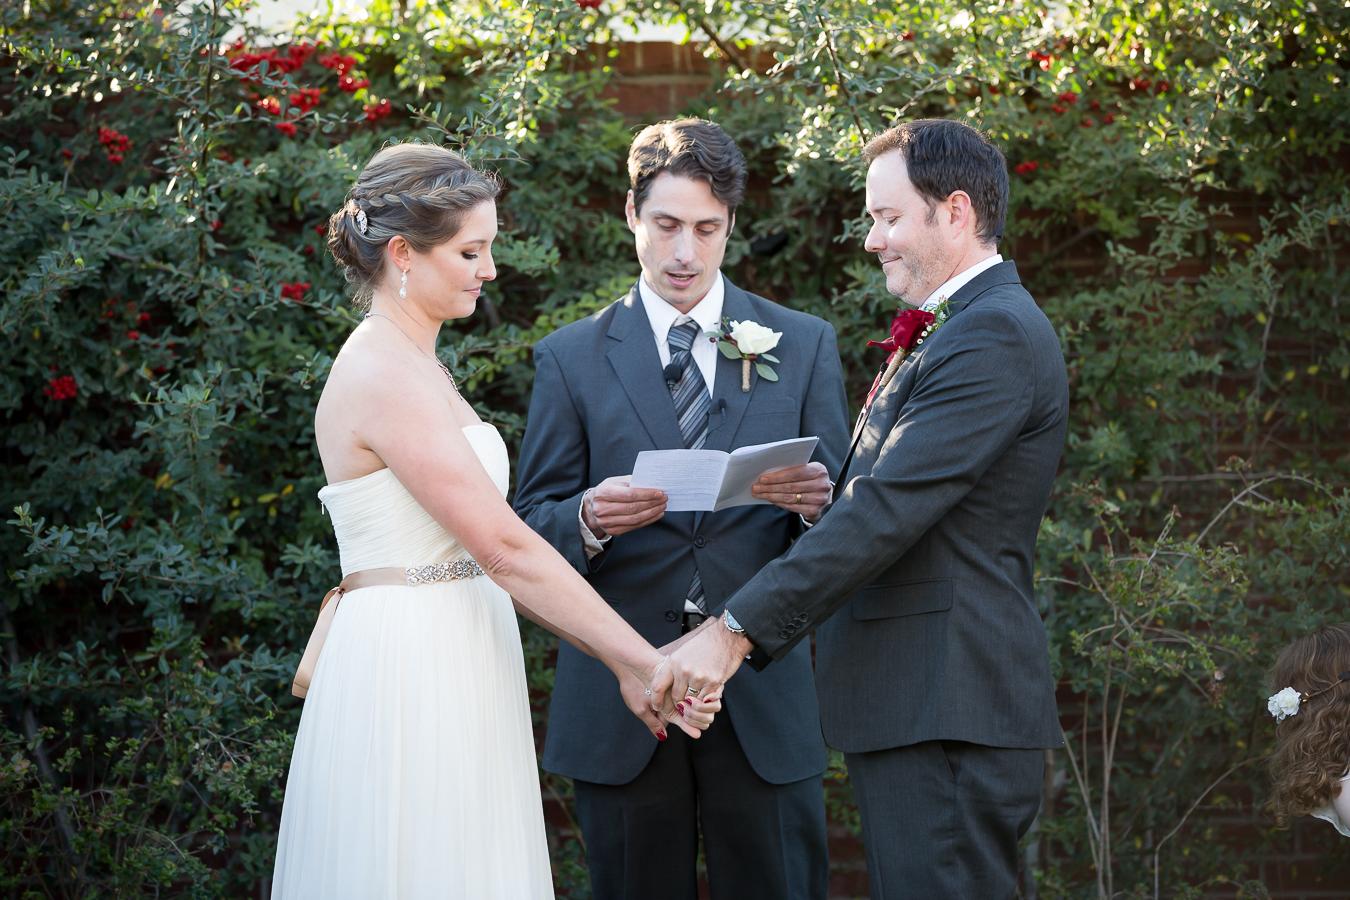 union-on-eighth-wedding-photographs-006.jpg